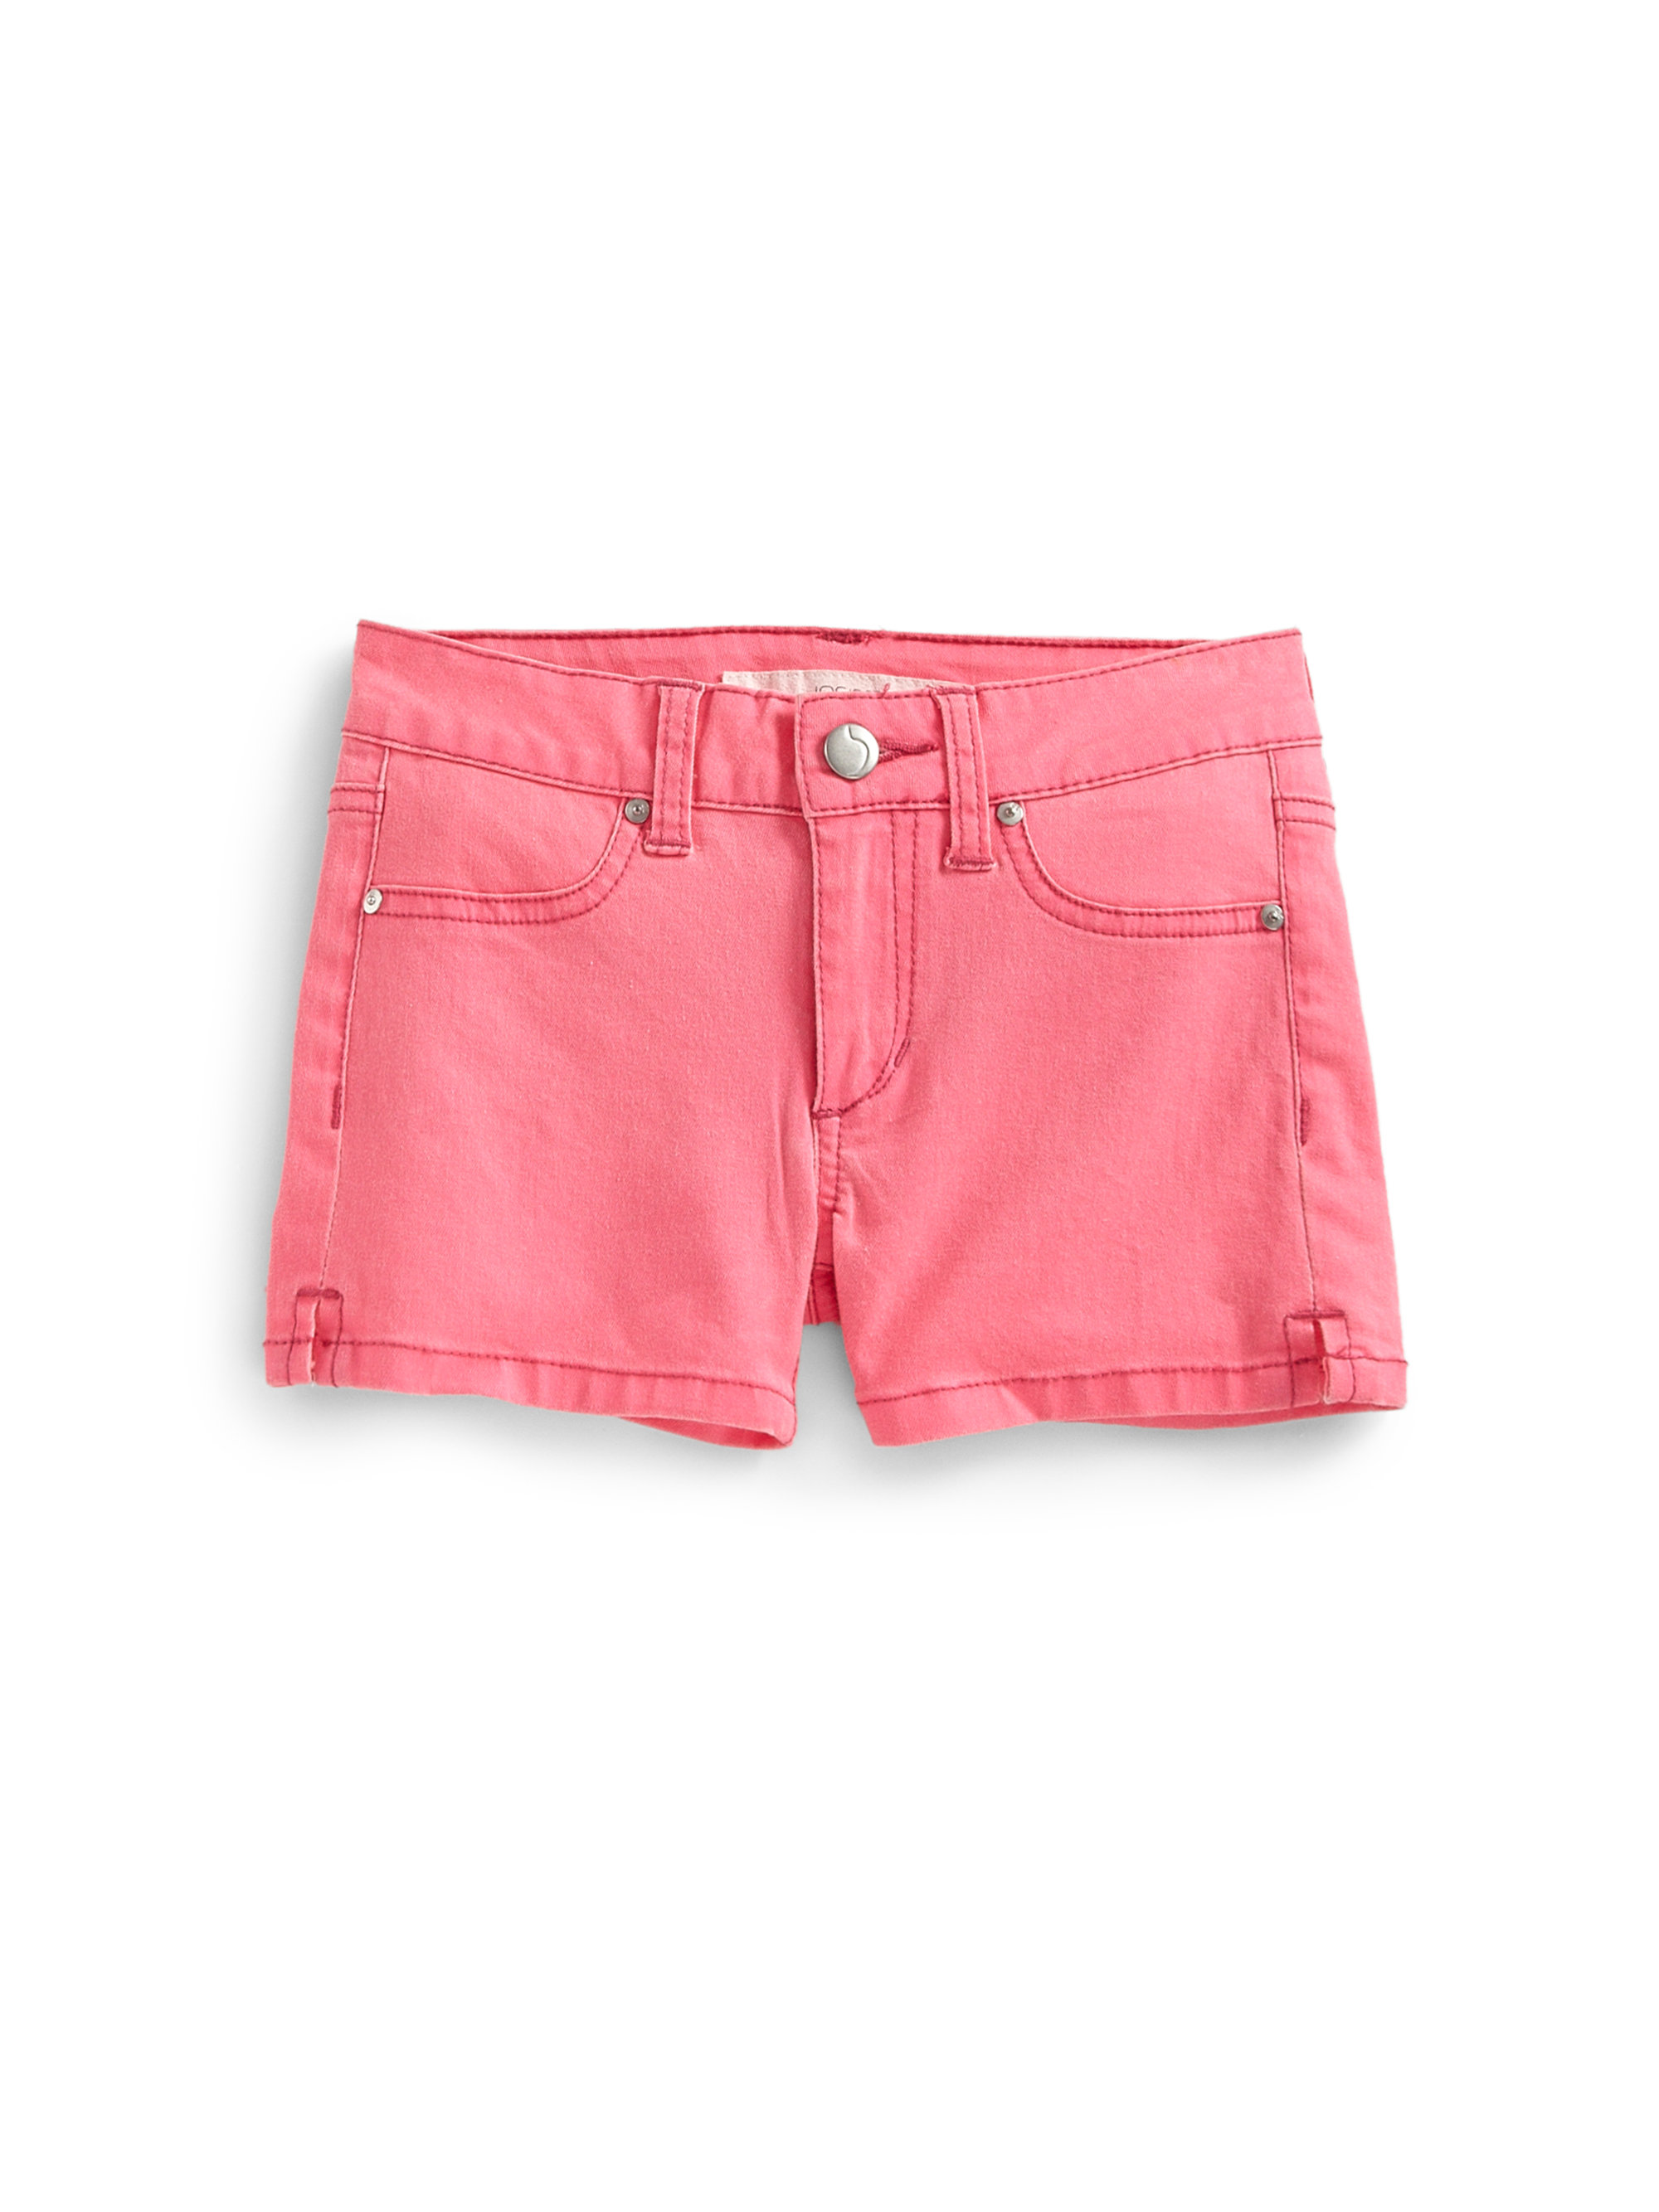 Joeu0026#39;s jeans Girls Denim Shorts in Pink | Lyst